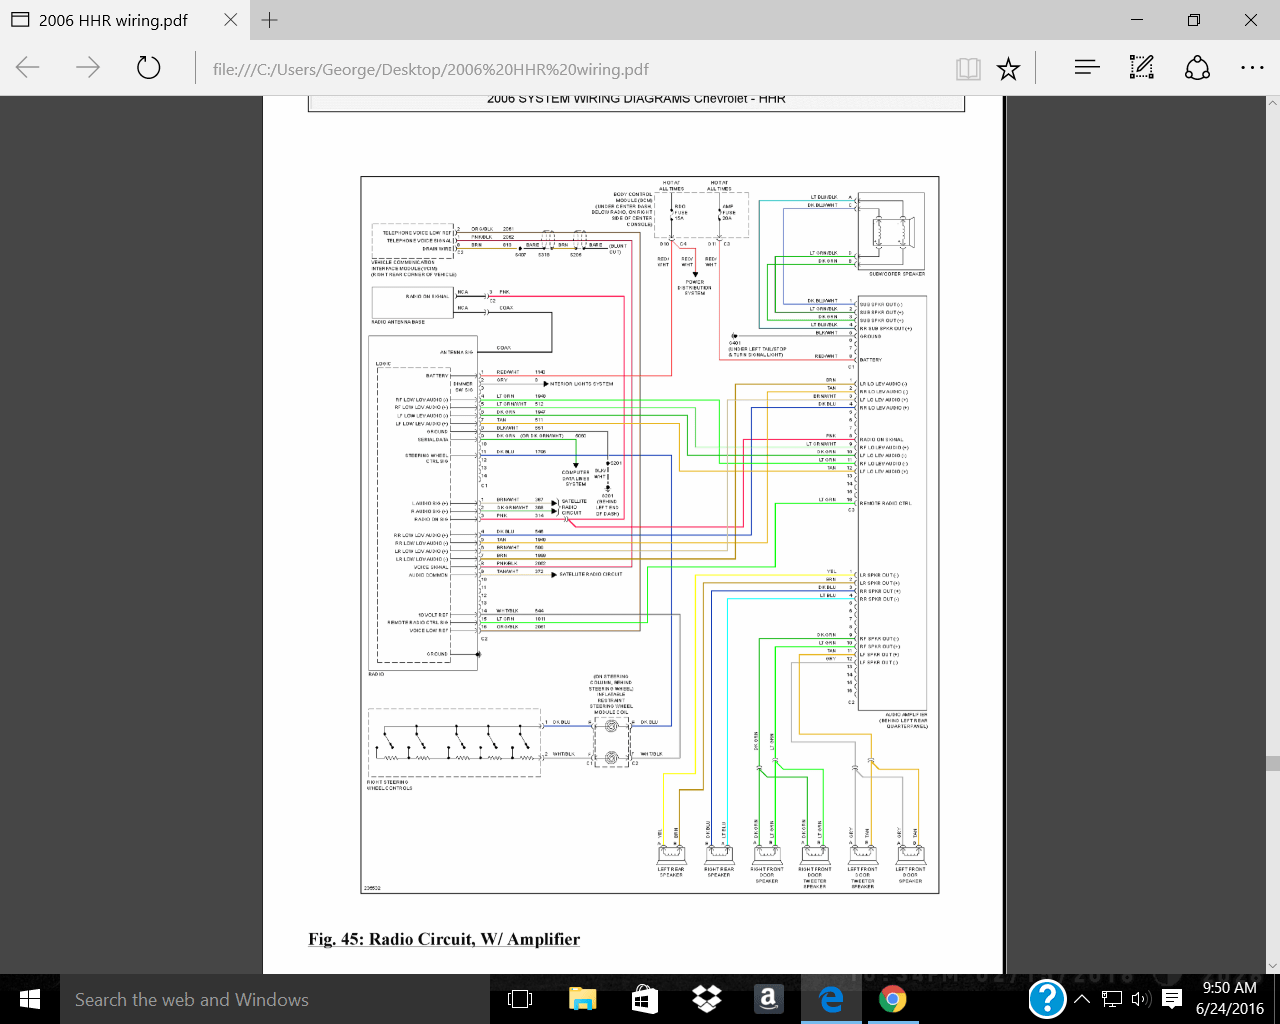 Mesmerizing Isuzu Truck Stereo Wiring Diagram Pictures - Best Image ...